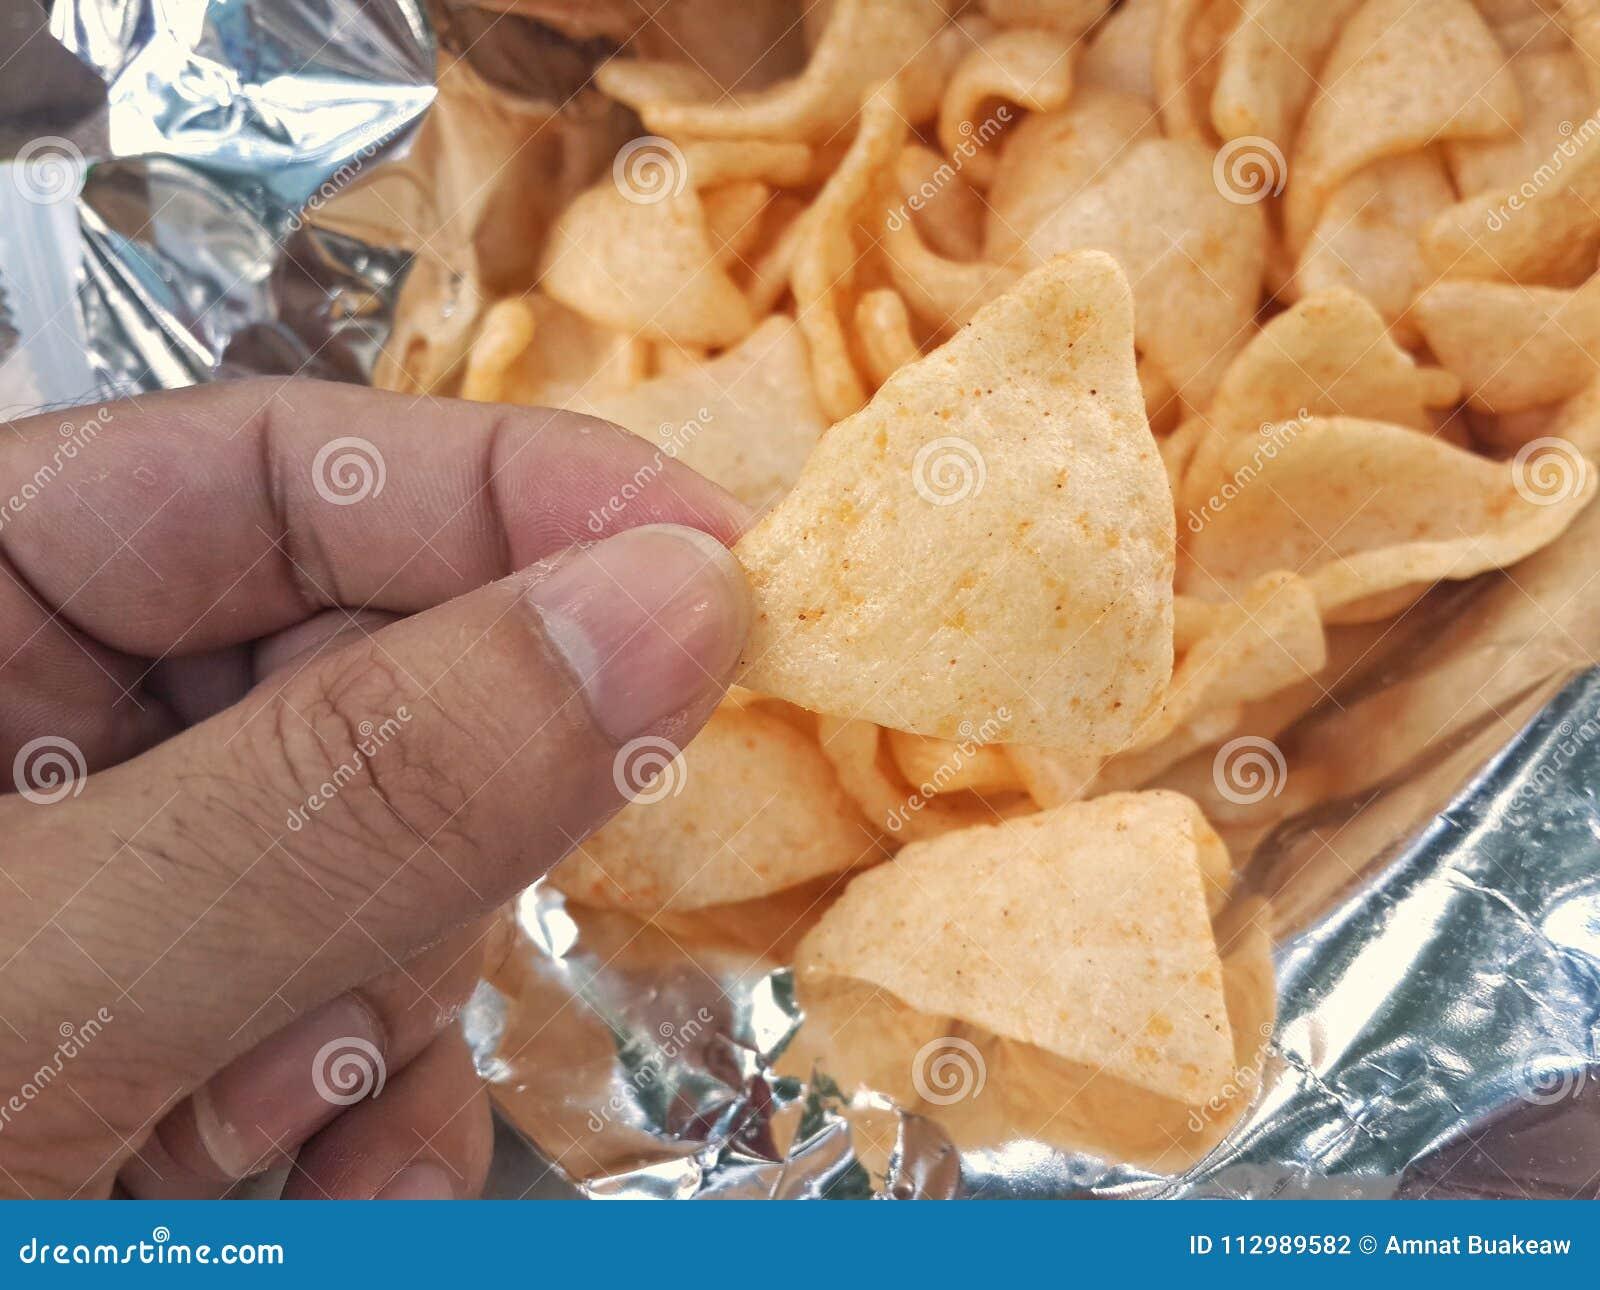 Shrimp rice cracker snack, Snack and fingers, Cookie crispy spongy in Bag Freud;